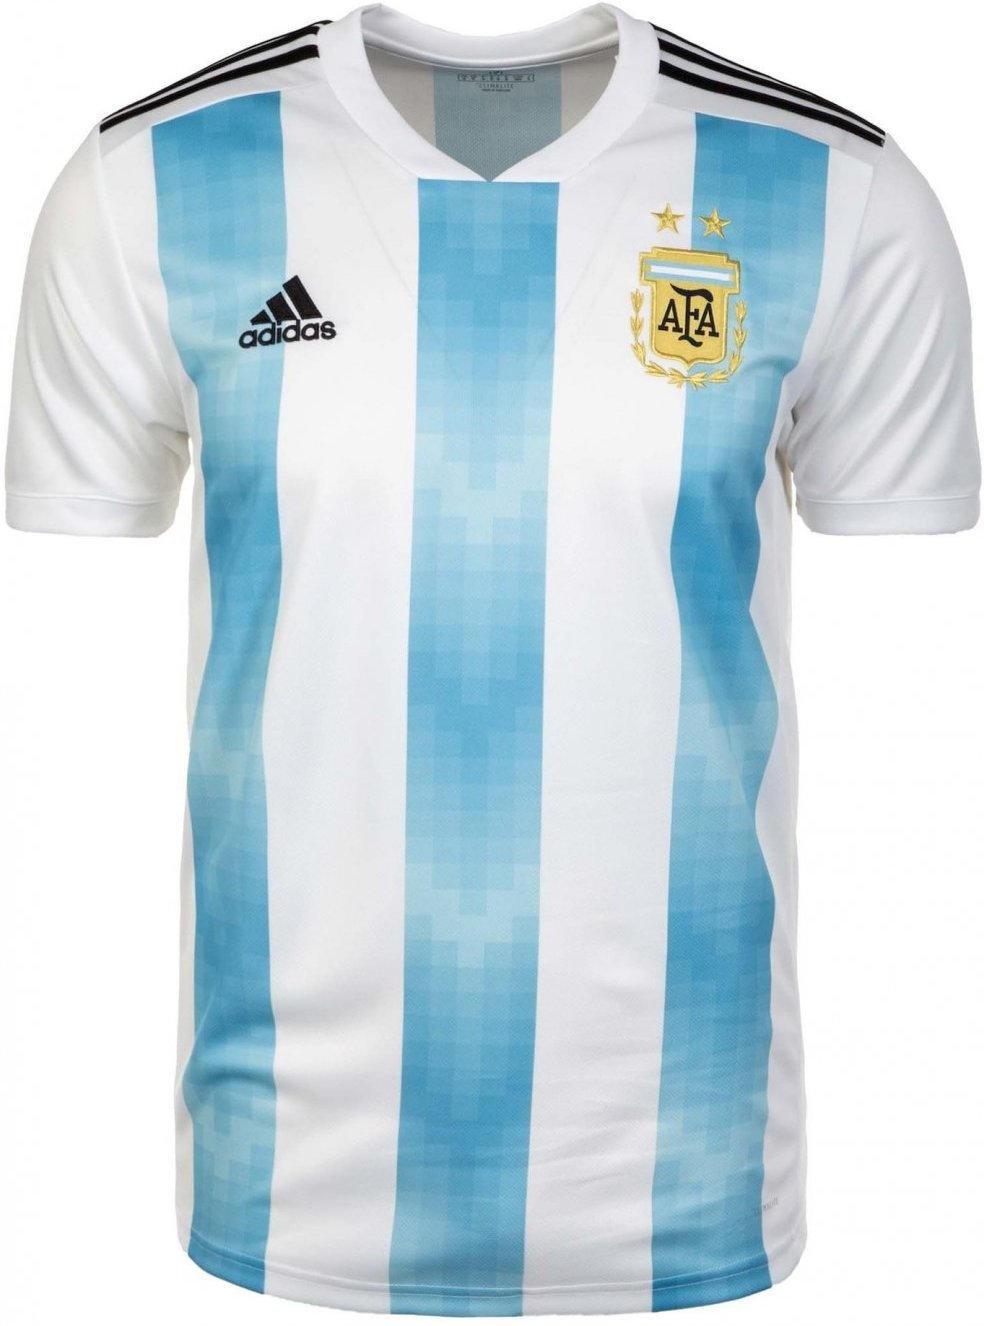 Argentinien AFA Adidas Trikot